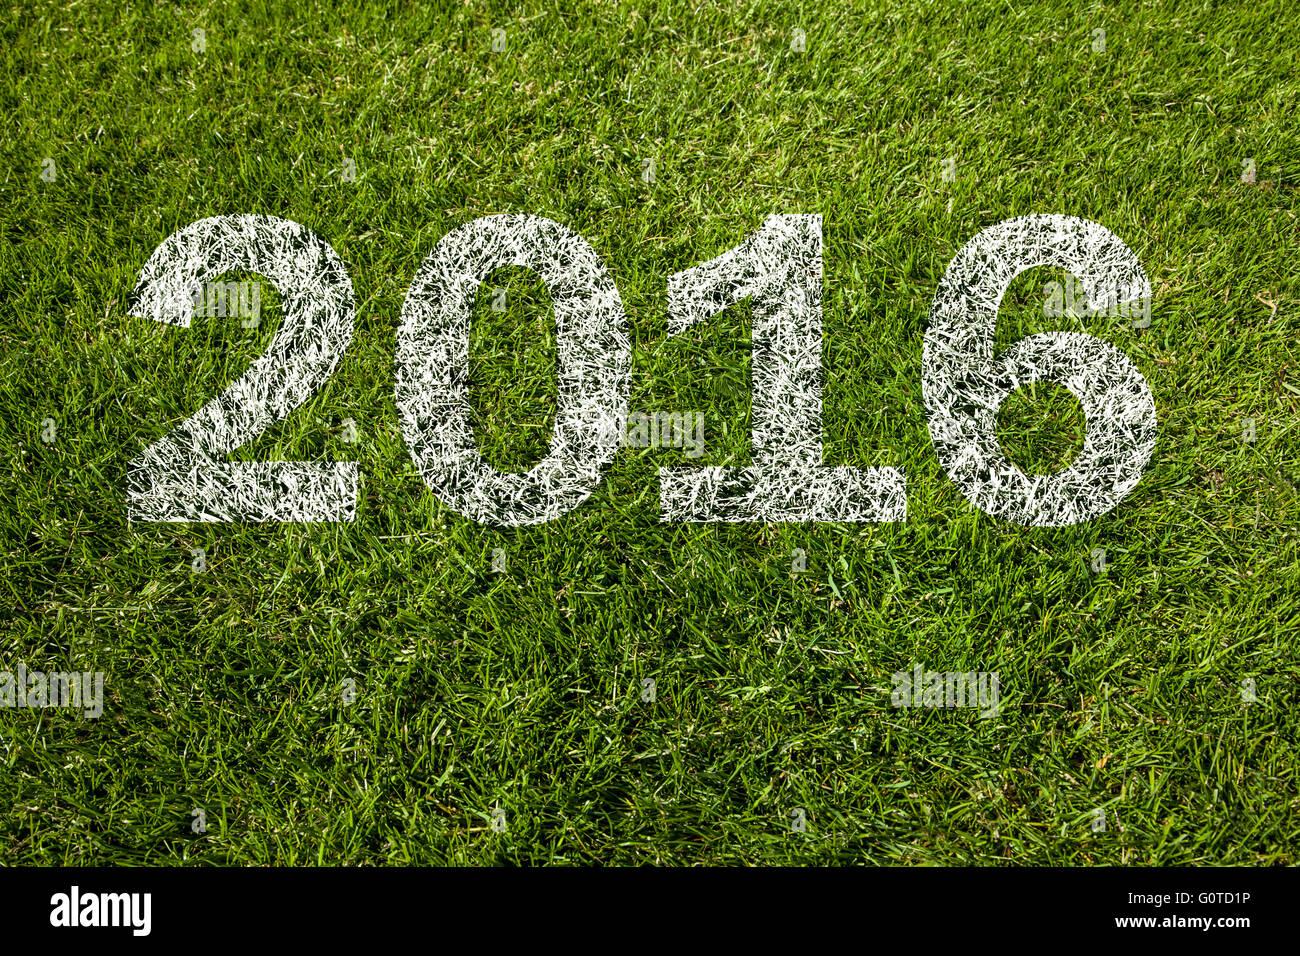 Football 2016 - Stock Image